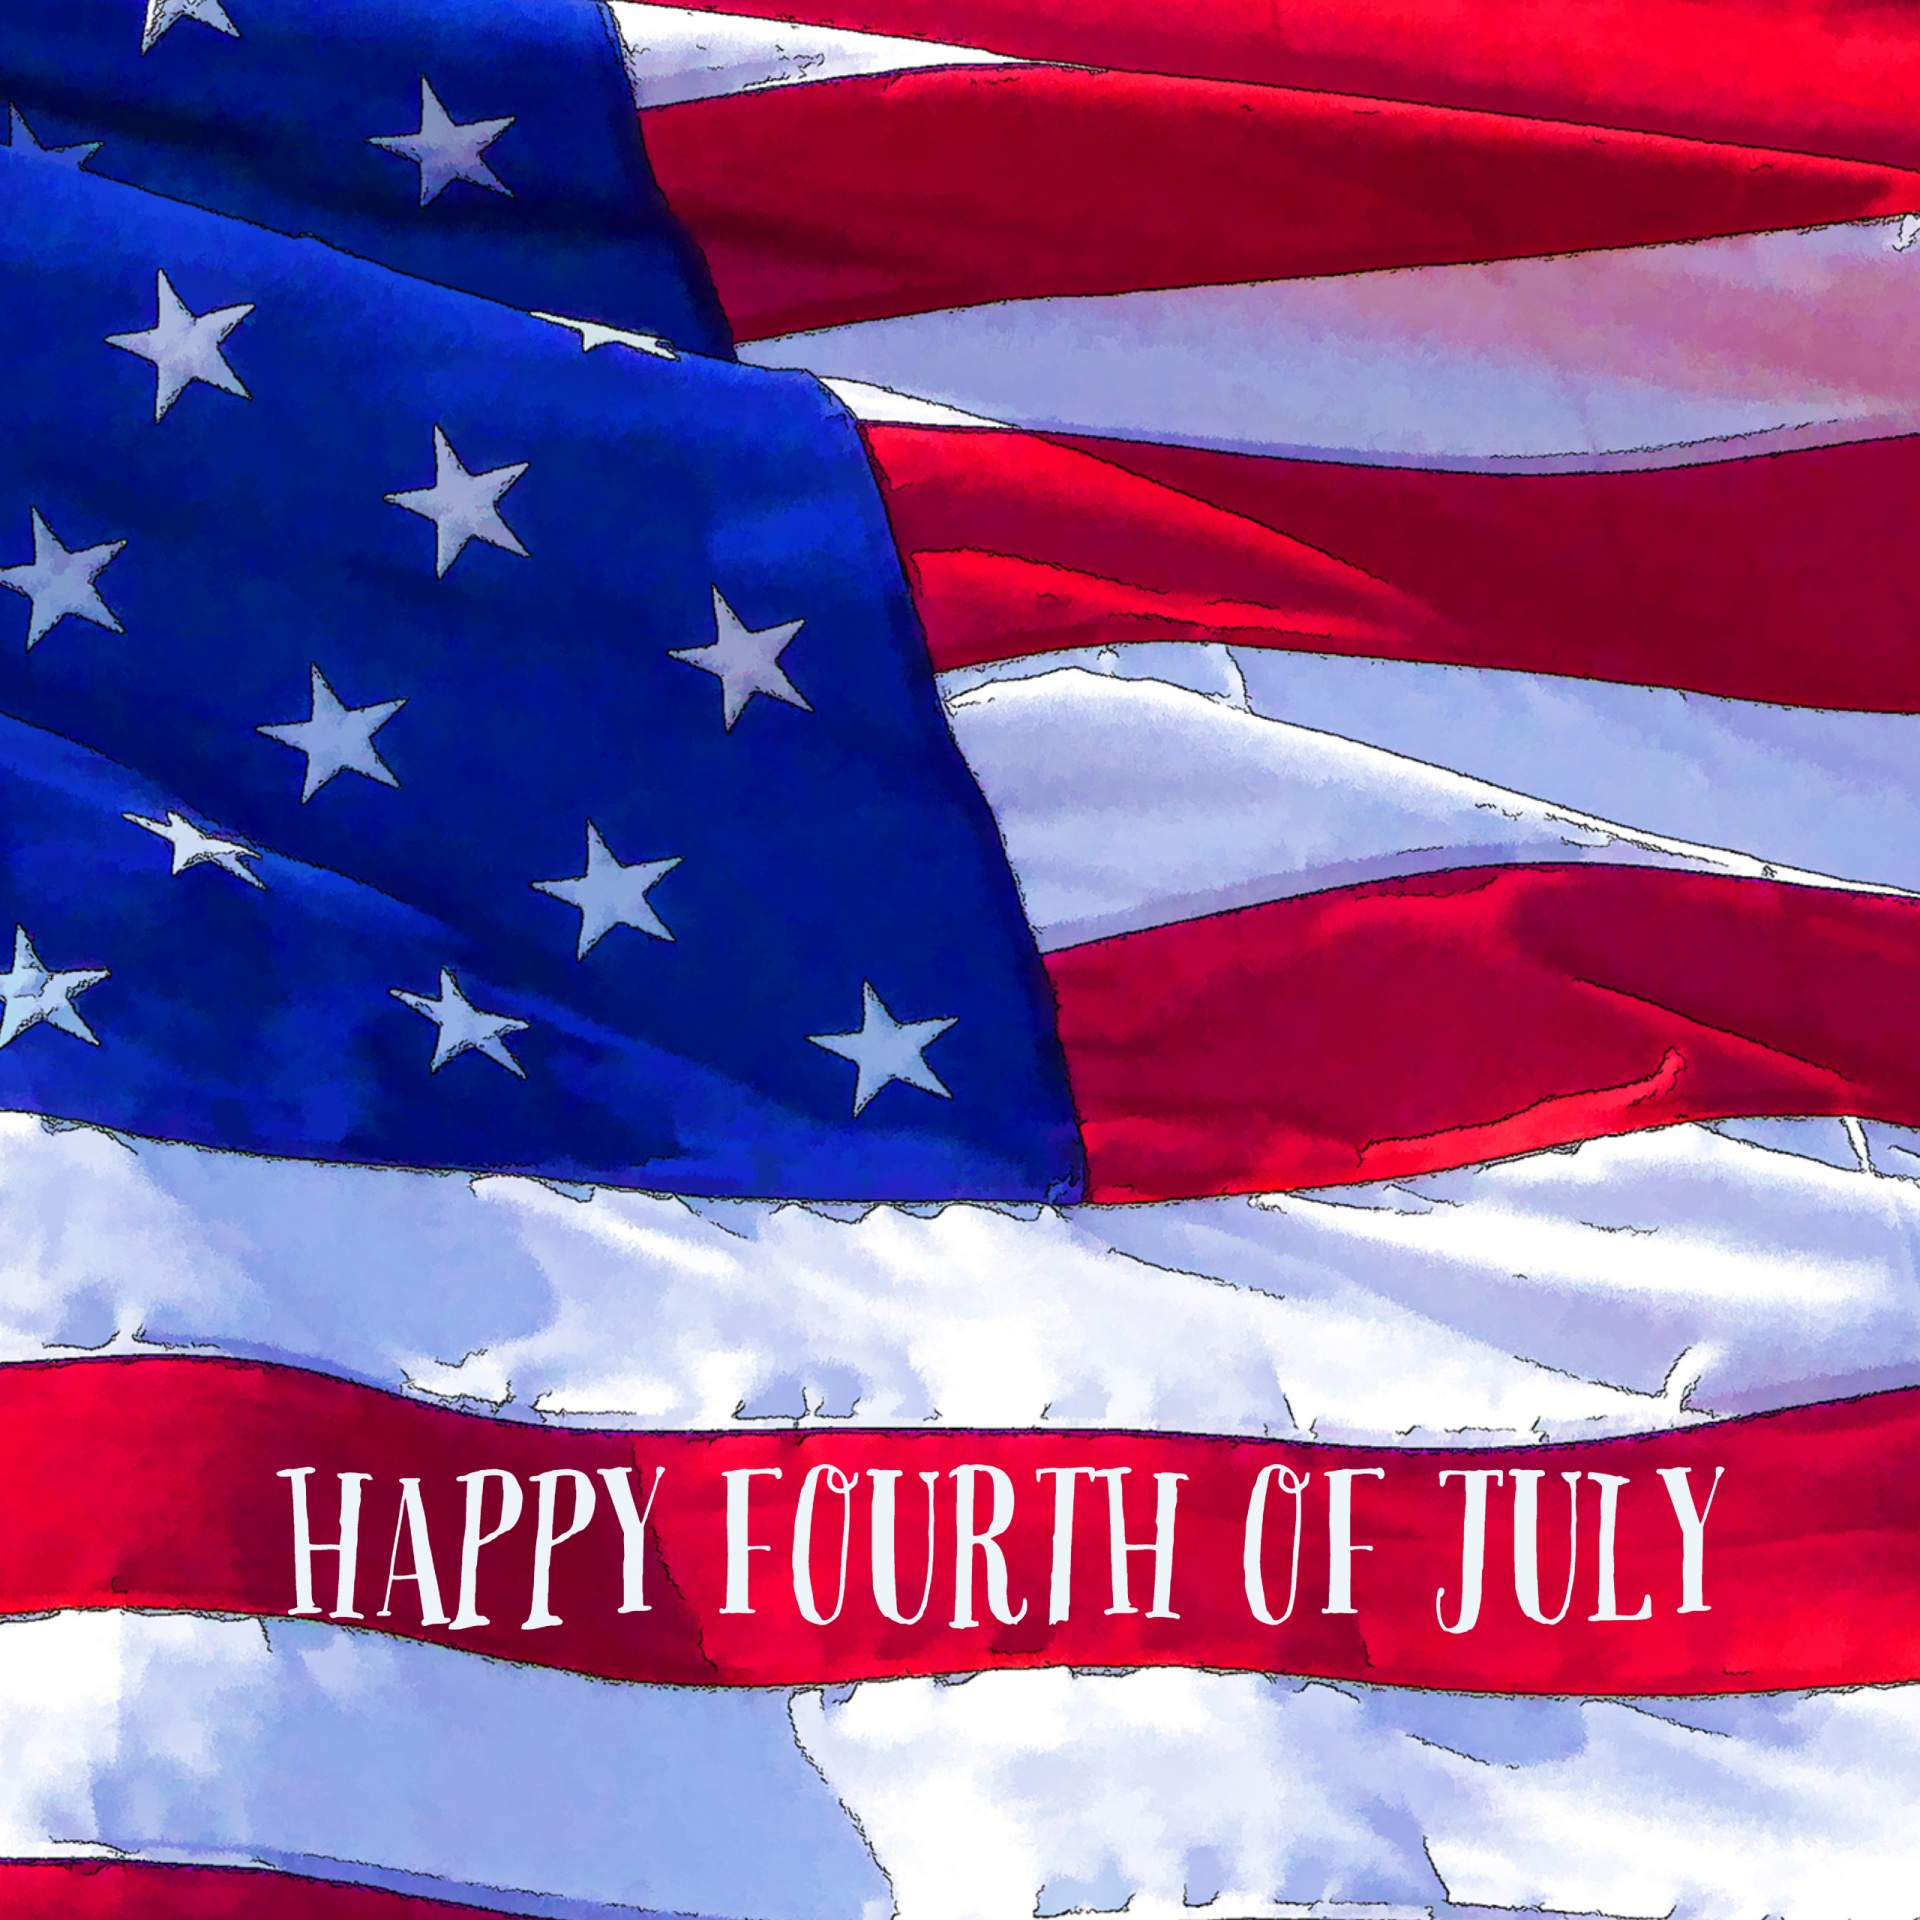 happy-fourth-of-july - Copy